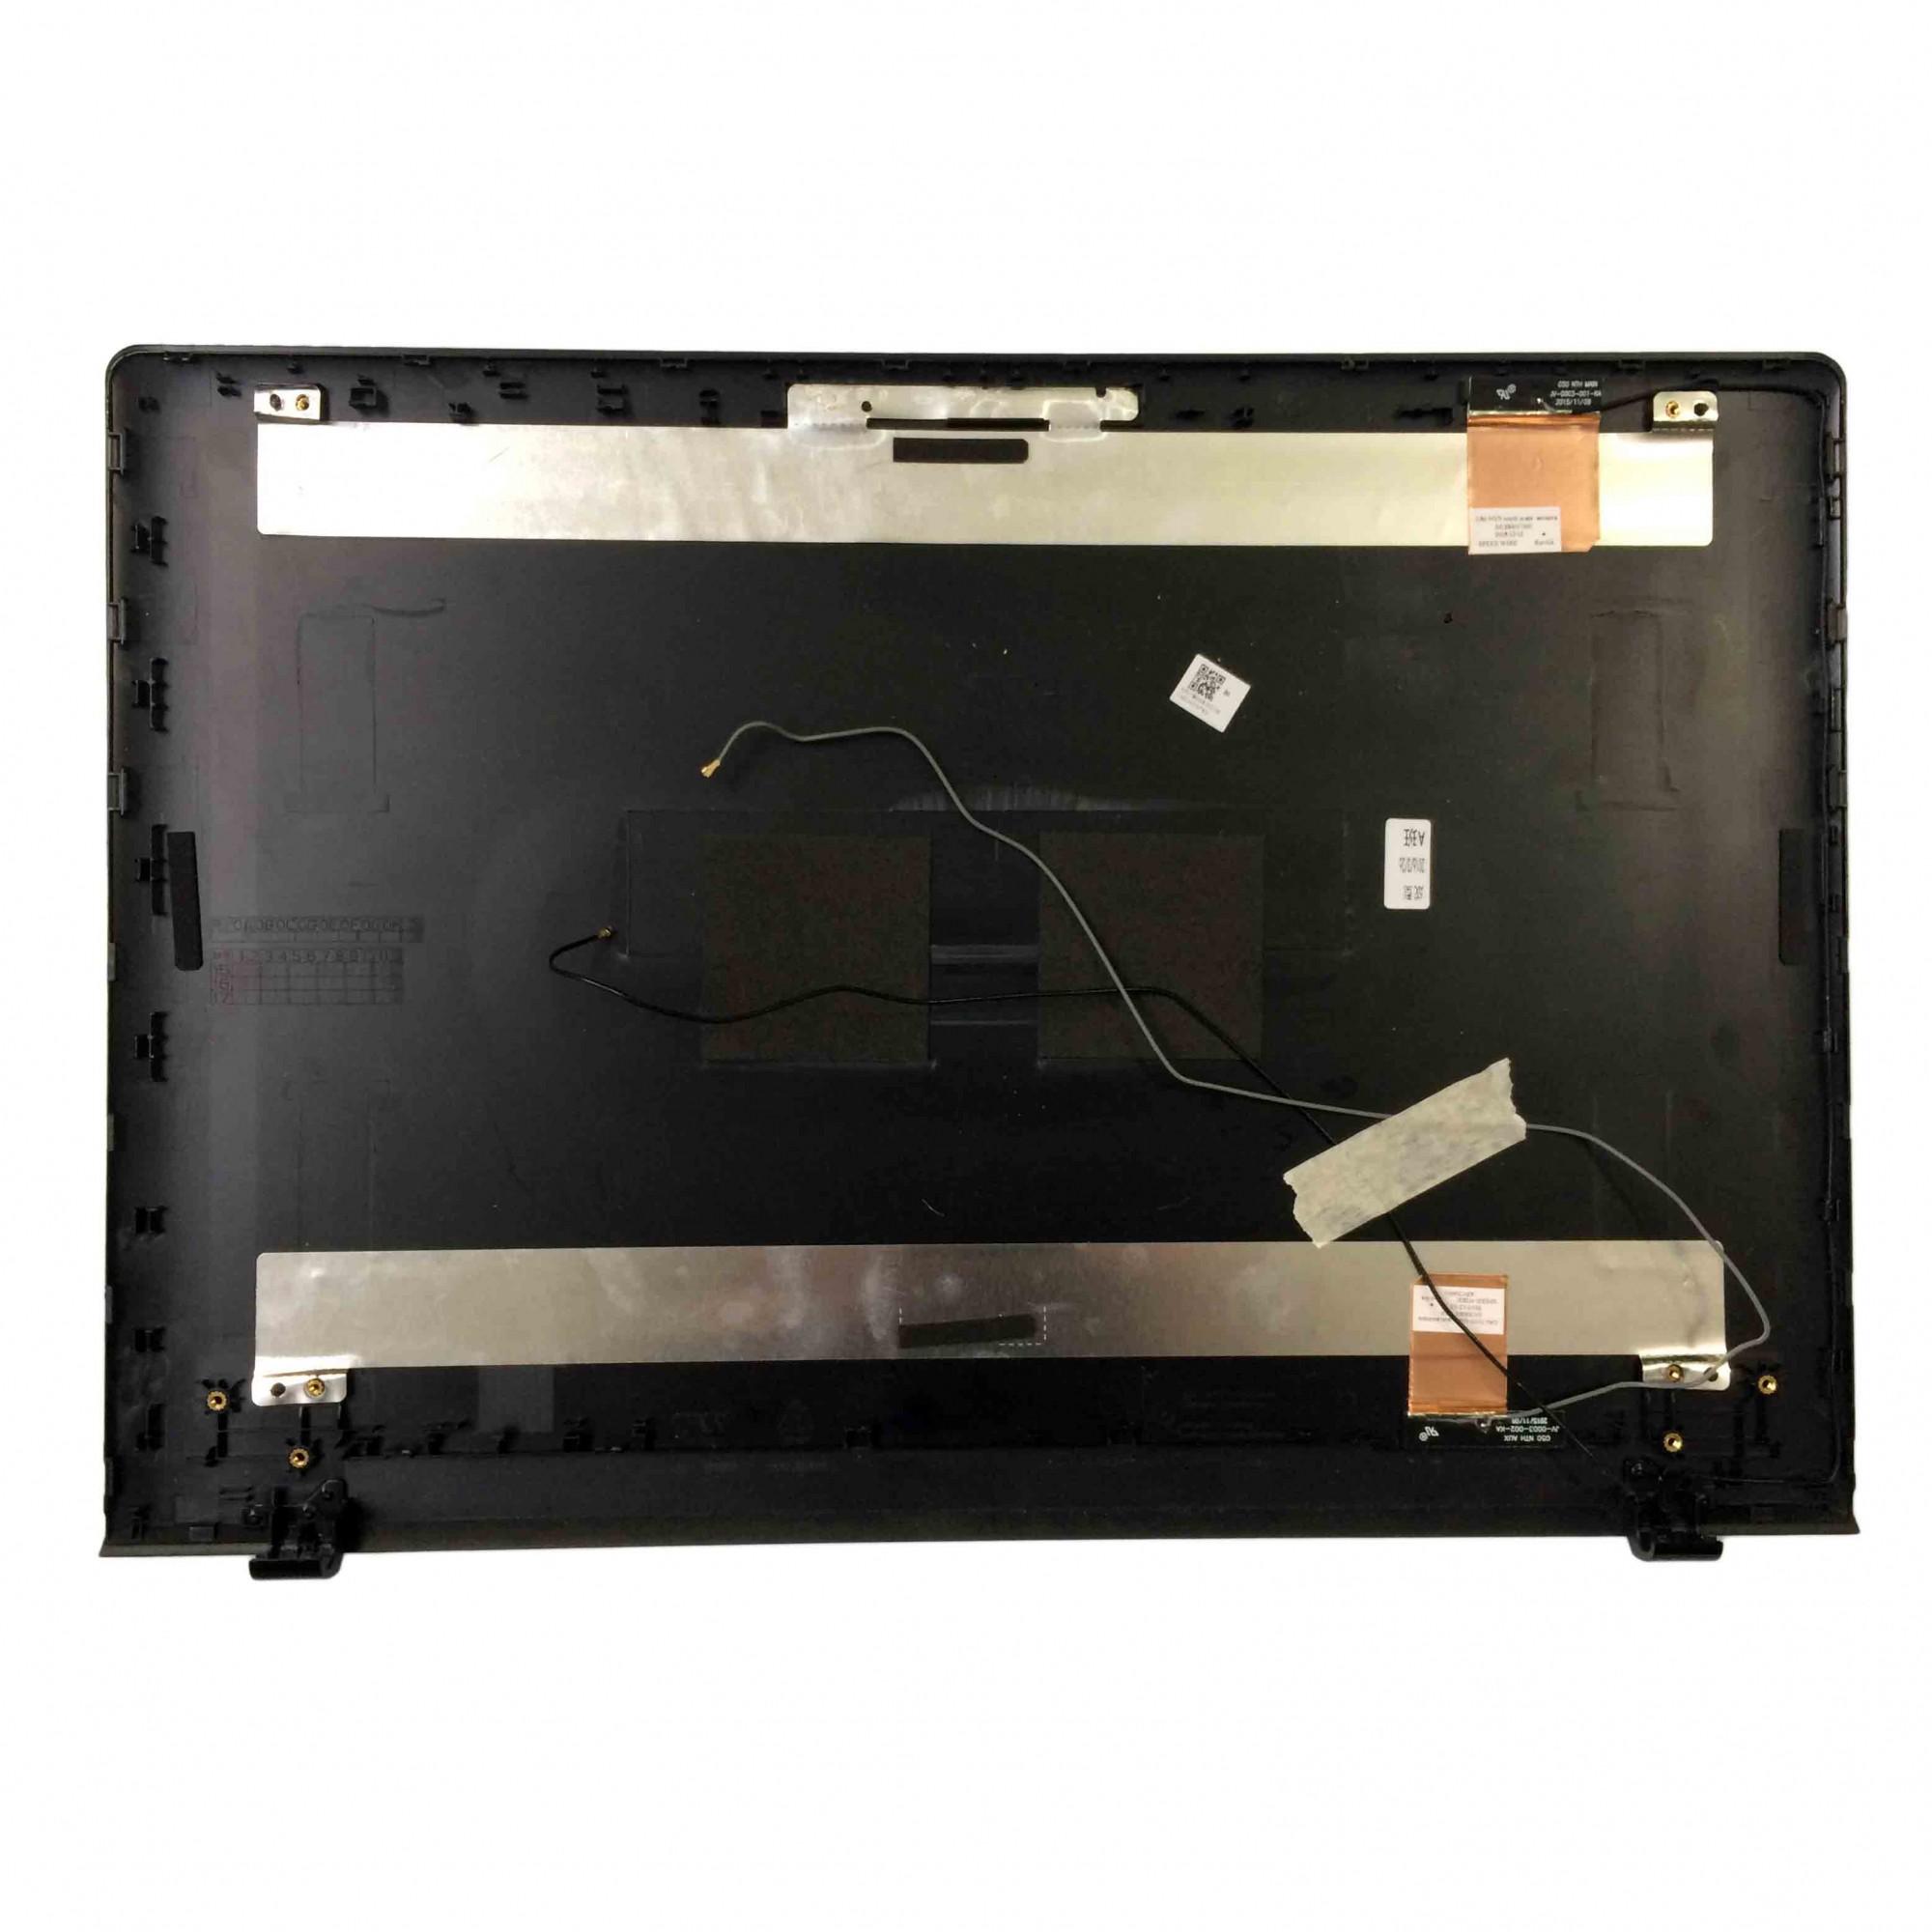 Carcaça Tampa LCD + Antena Wi-fi Notebook Lenovo G50 G50-70 G50-80 PN:Ap0th0001a0 - Retirado